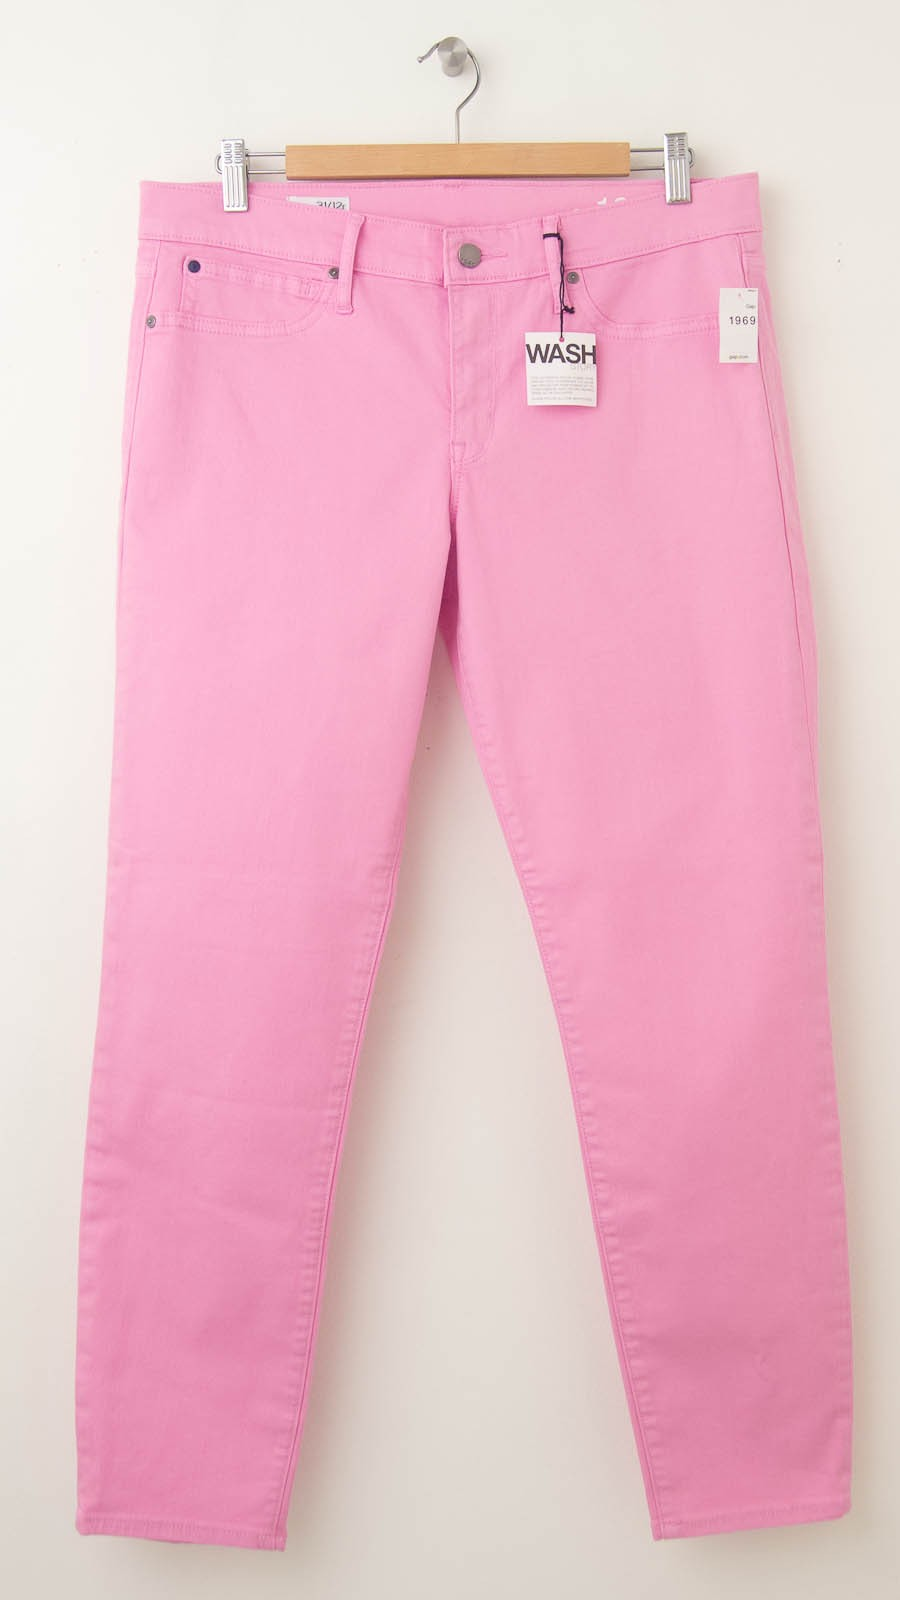 55778aab5d217 NEW Gap 1969 Legging Skimmer Jeans in Sugar Pink